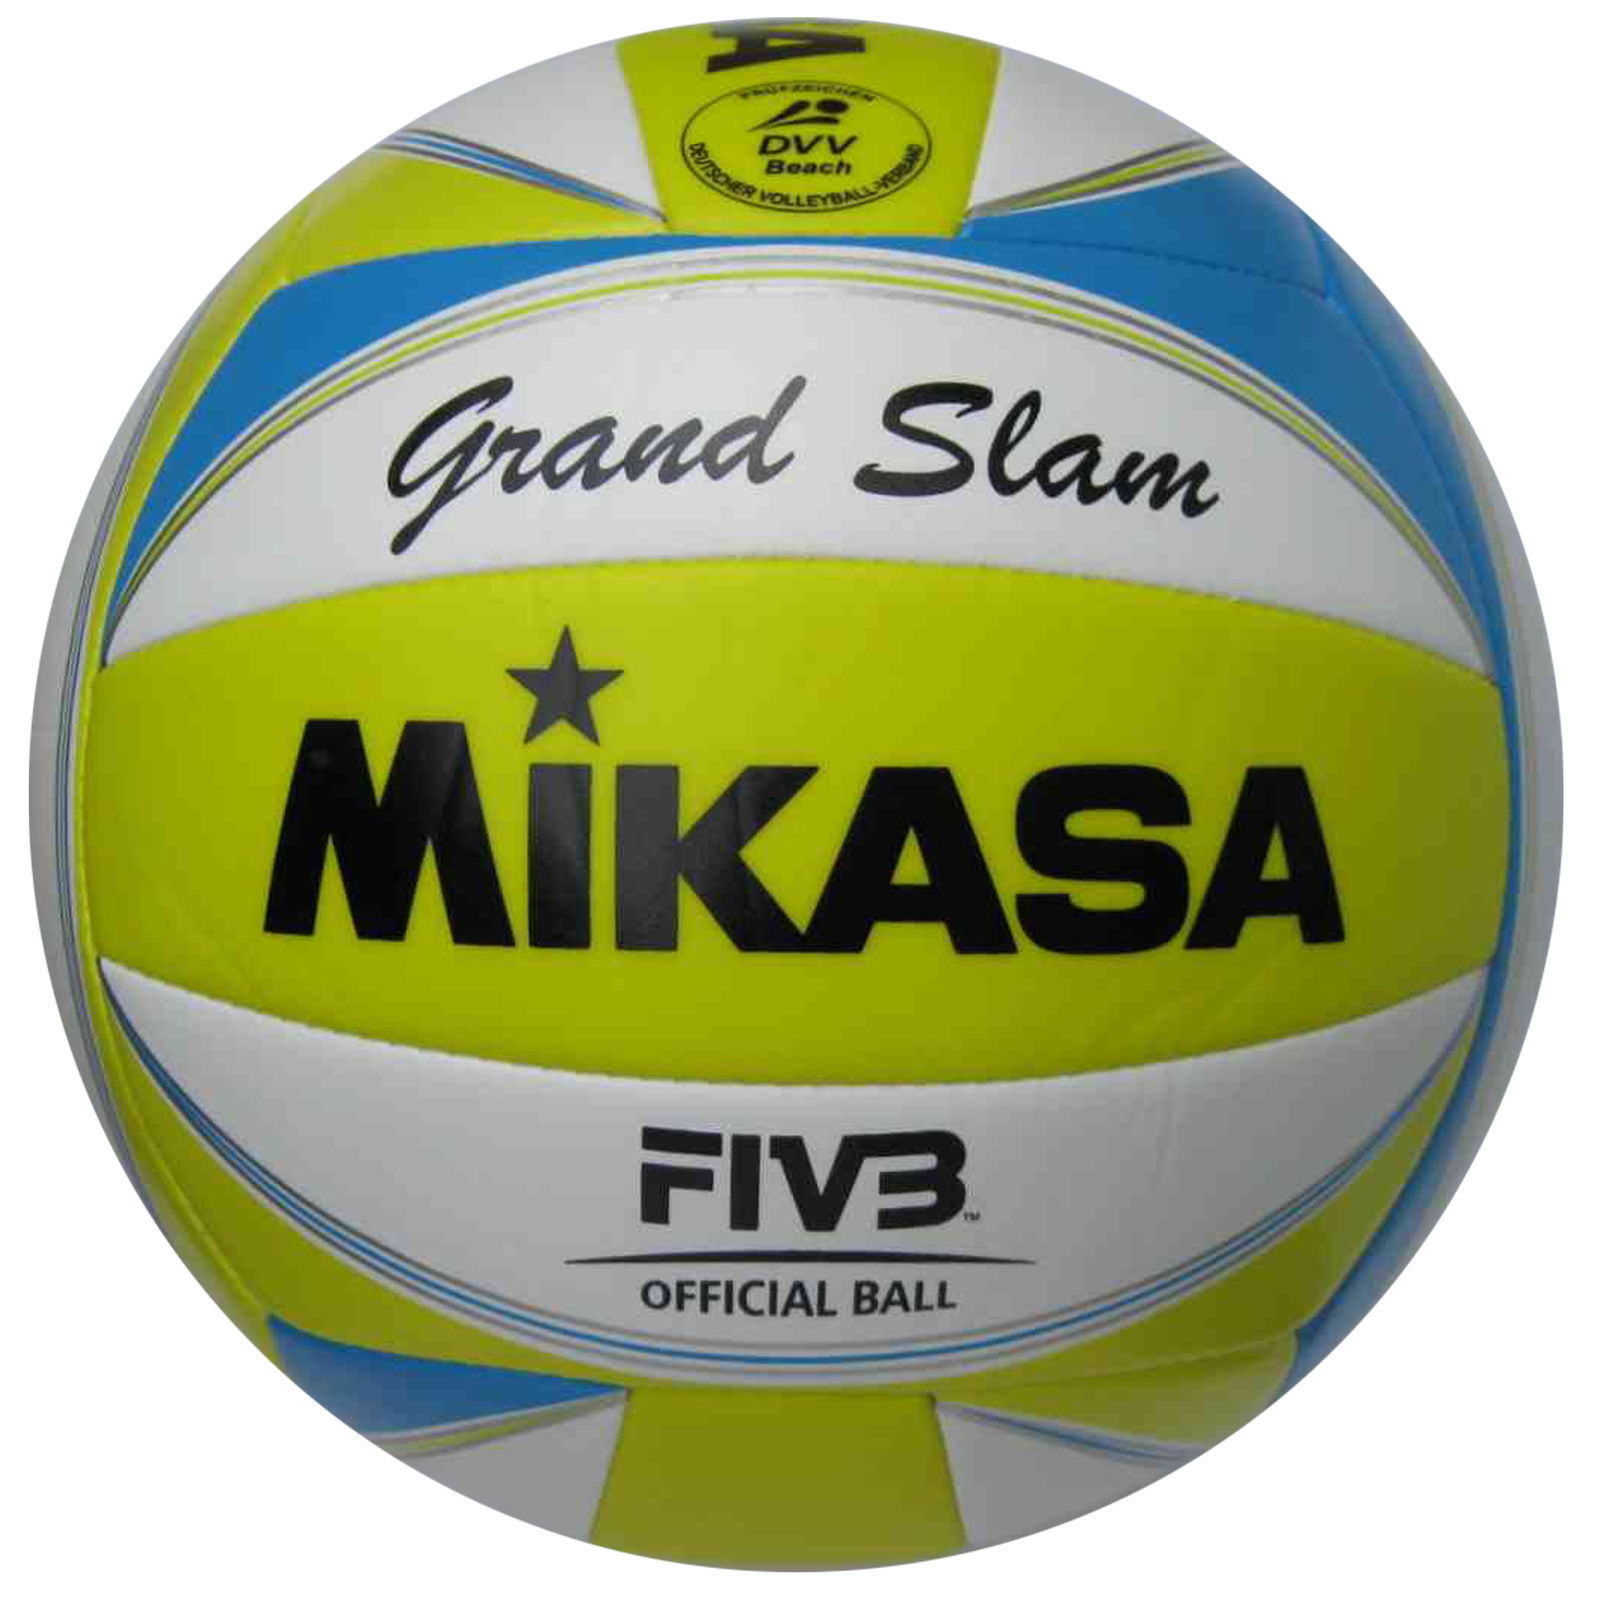 Mikasa Fivb Recreational Beach Volleyball